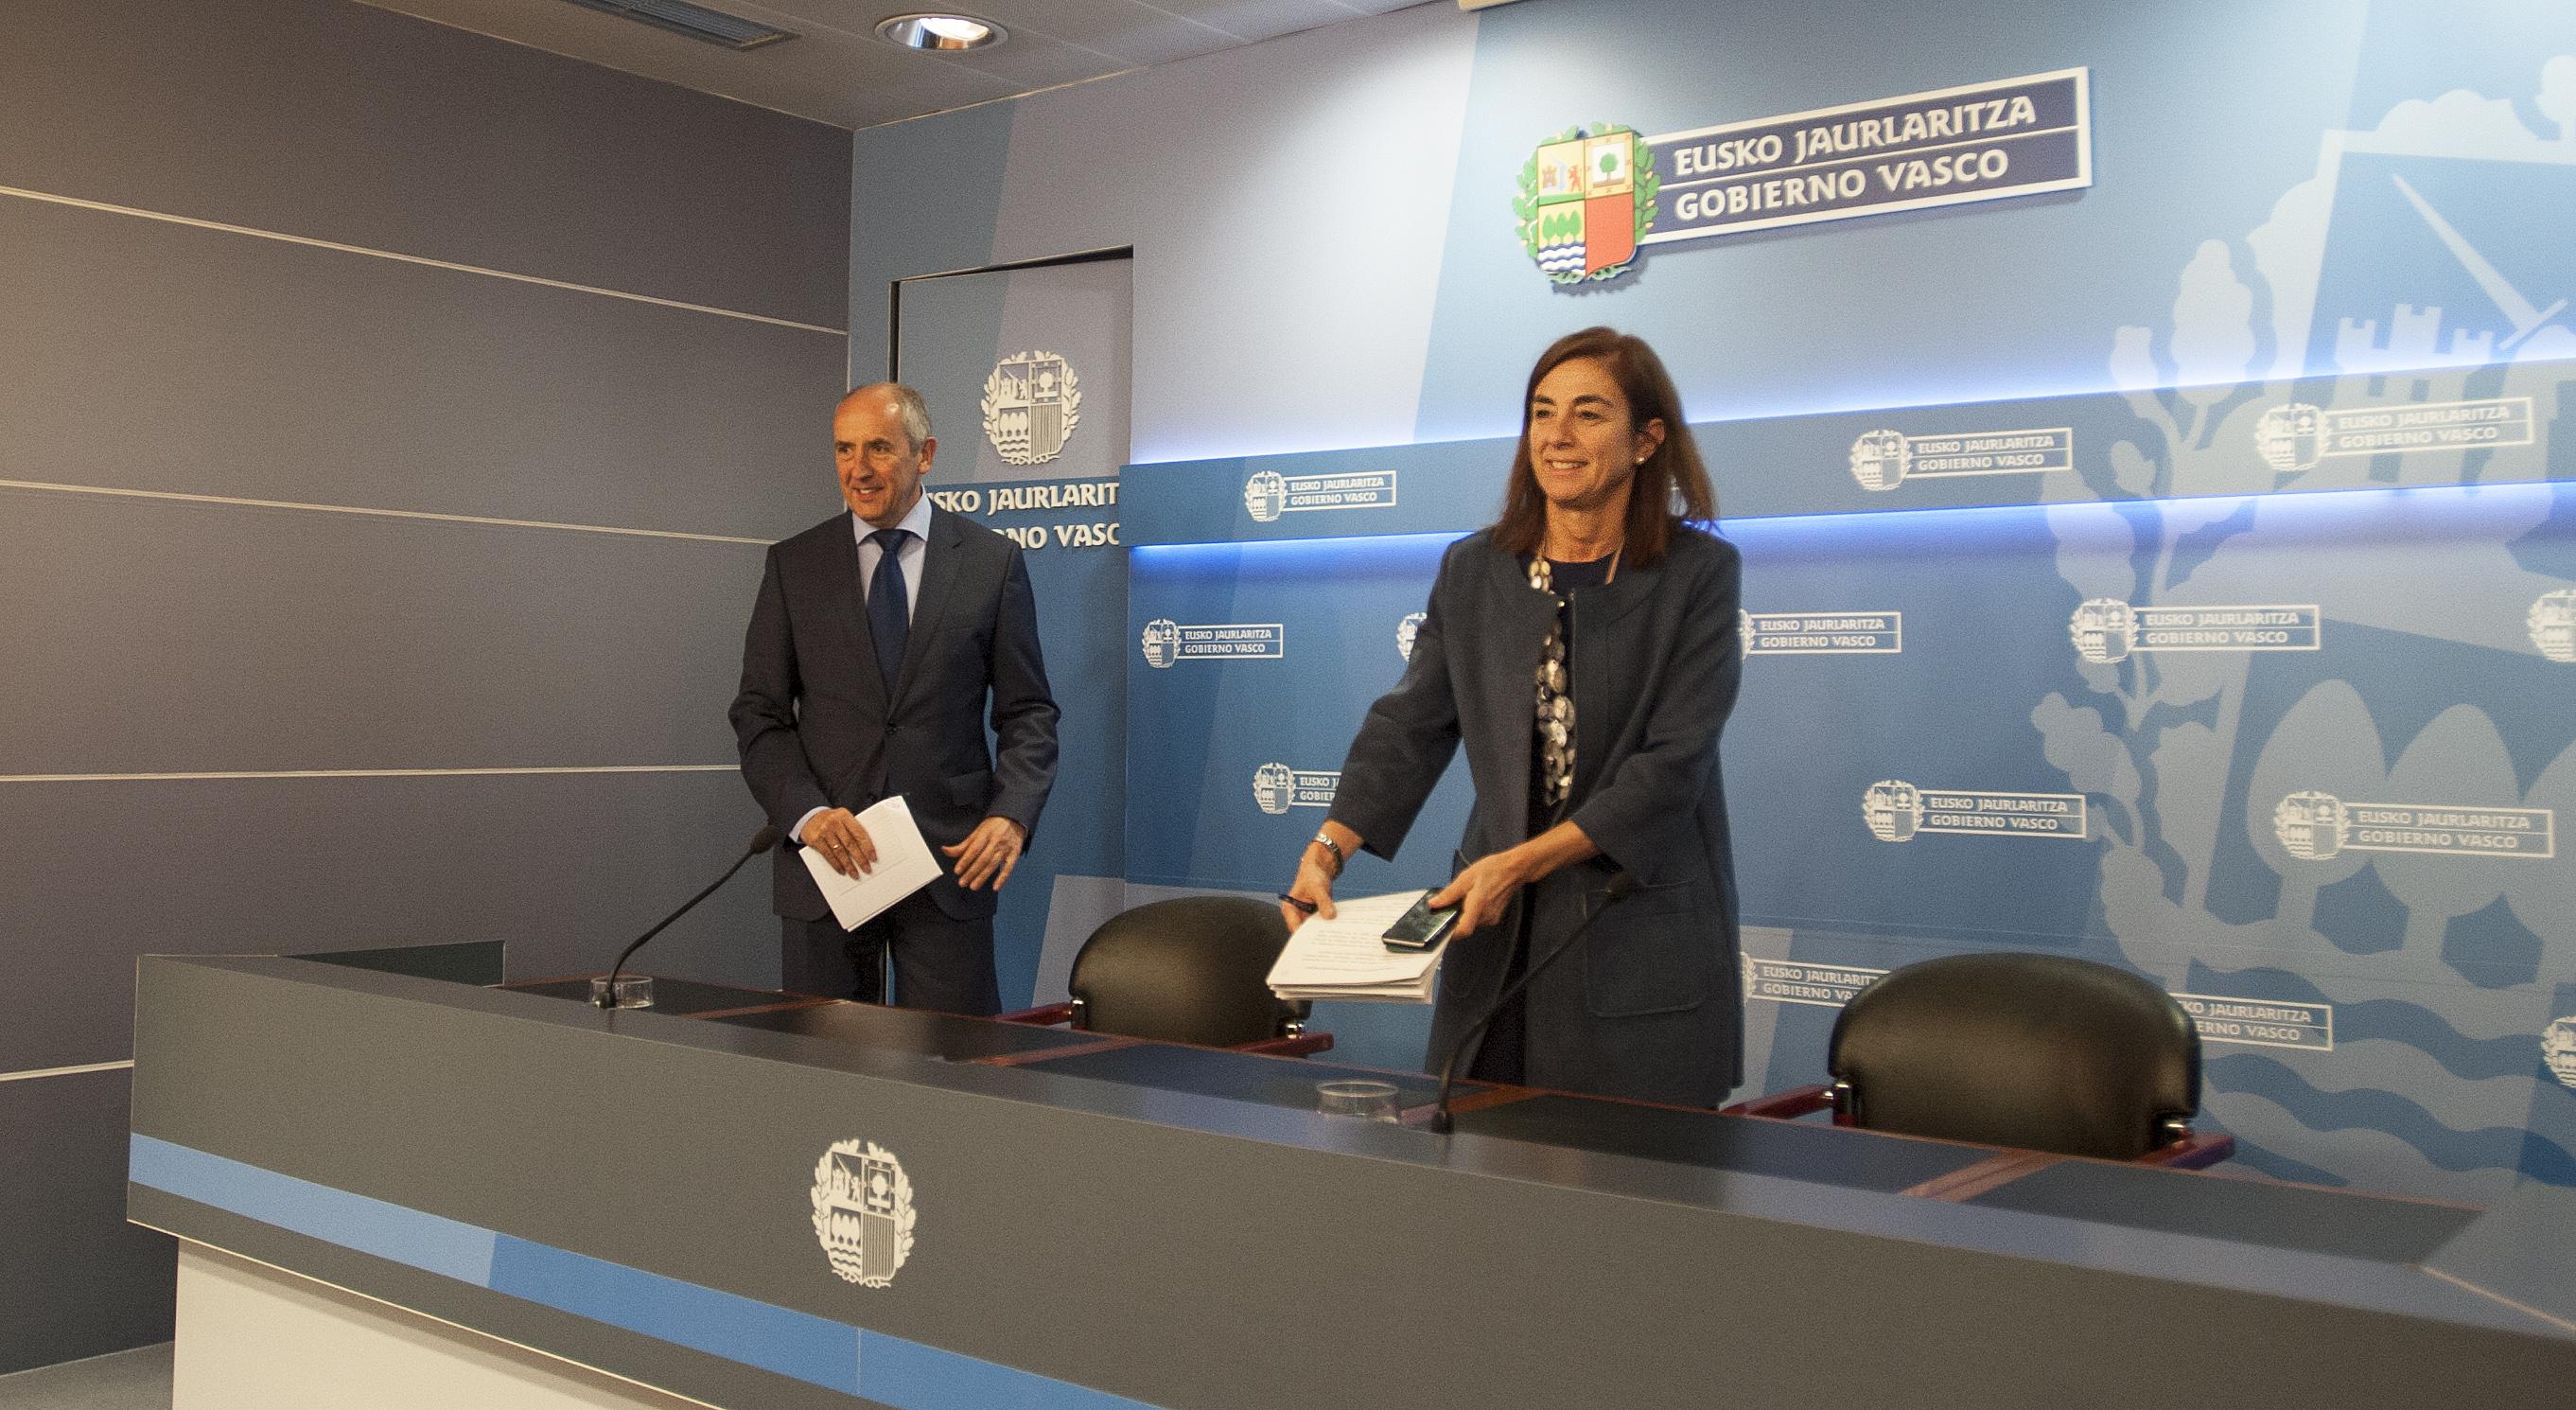 20151110_consejo_gobierno1.jpg